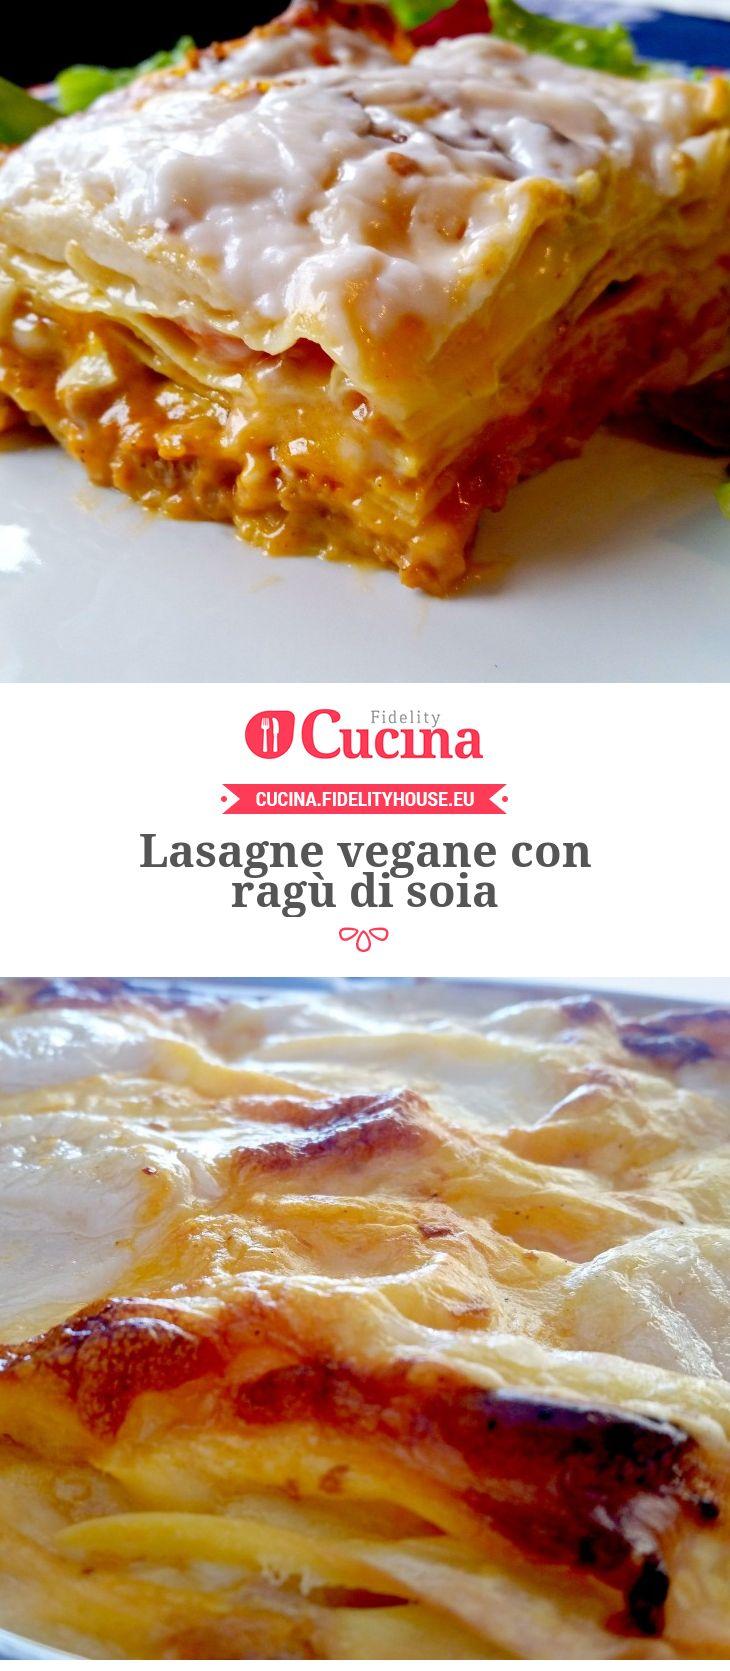 Lasagne vegane con ragù di soia